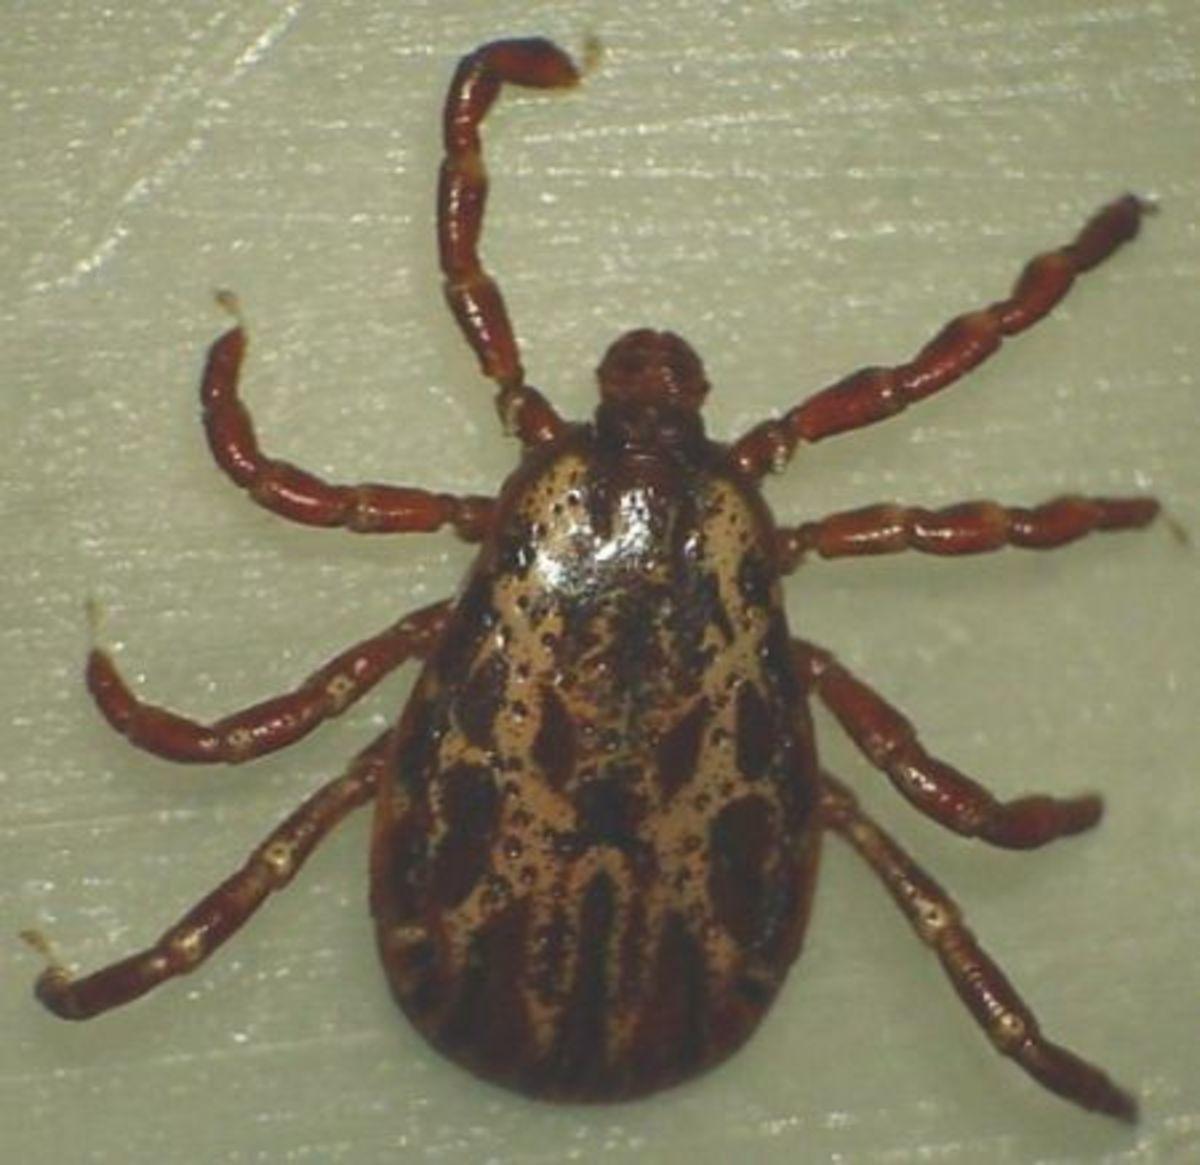 tick-identification